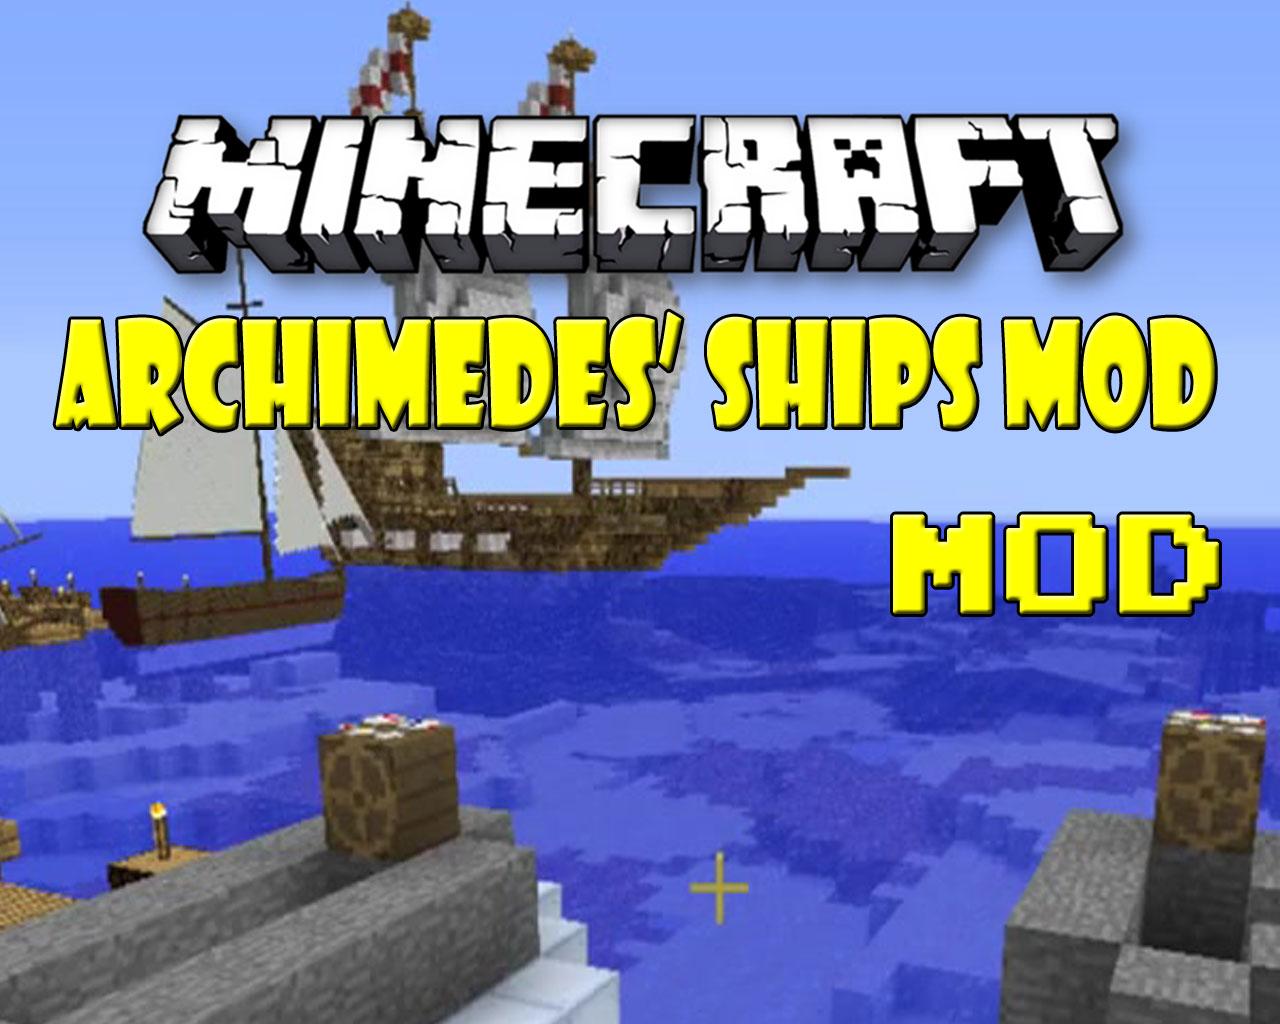 Archimedes' Ships Mod 1.7.10/1.7.2